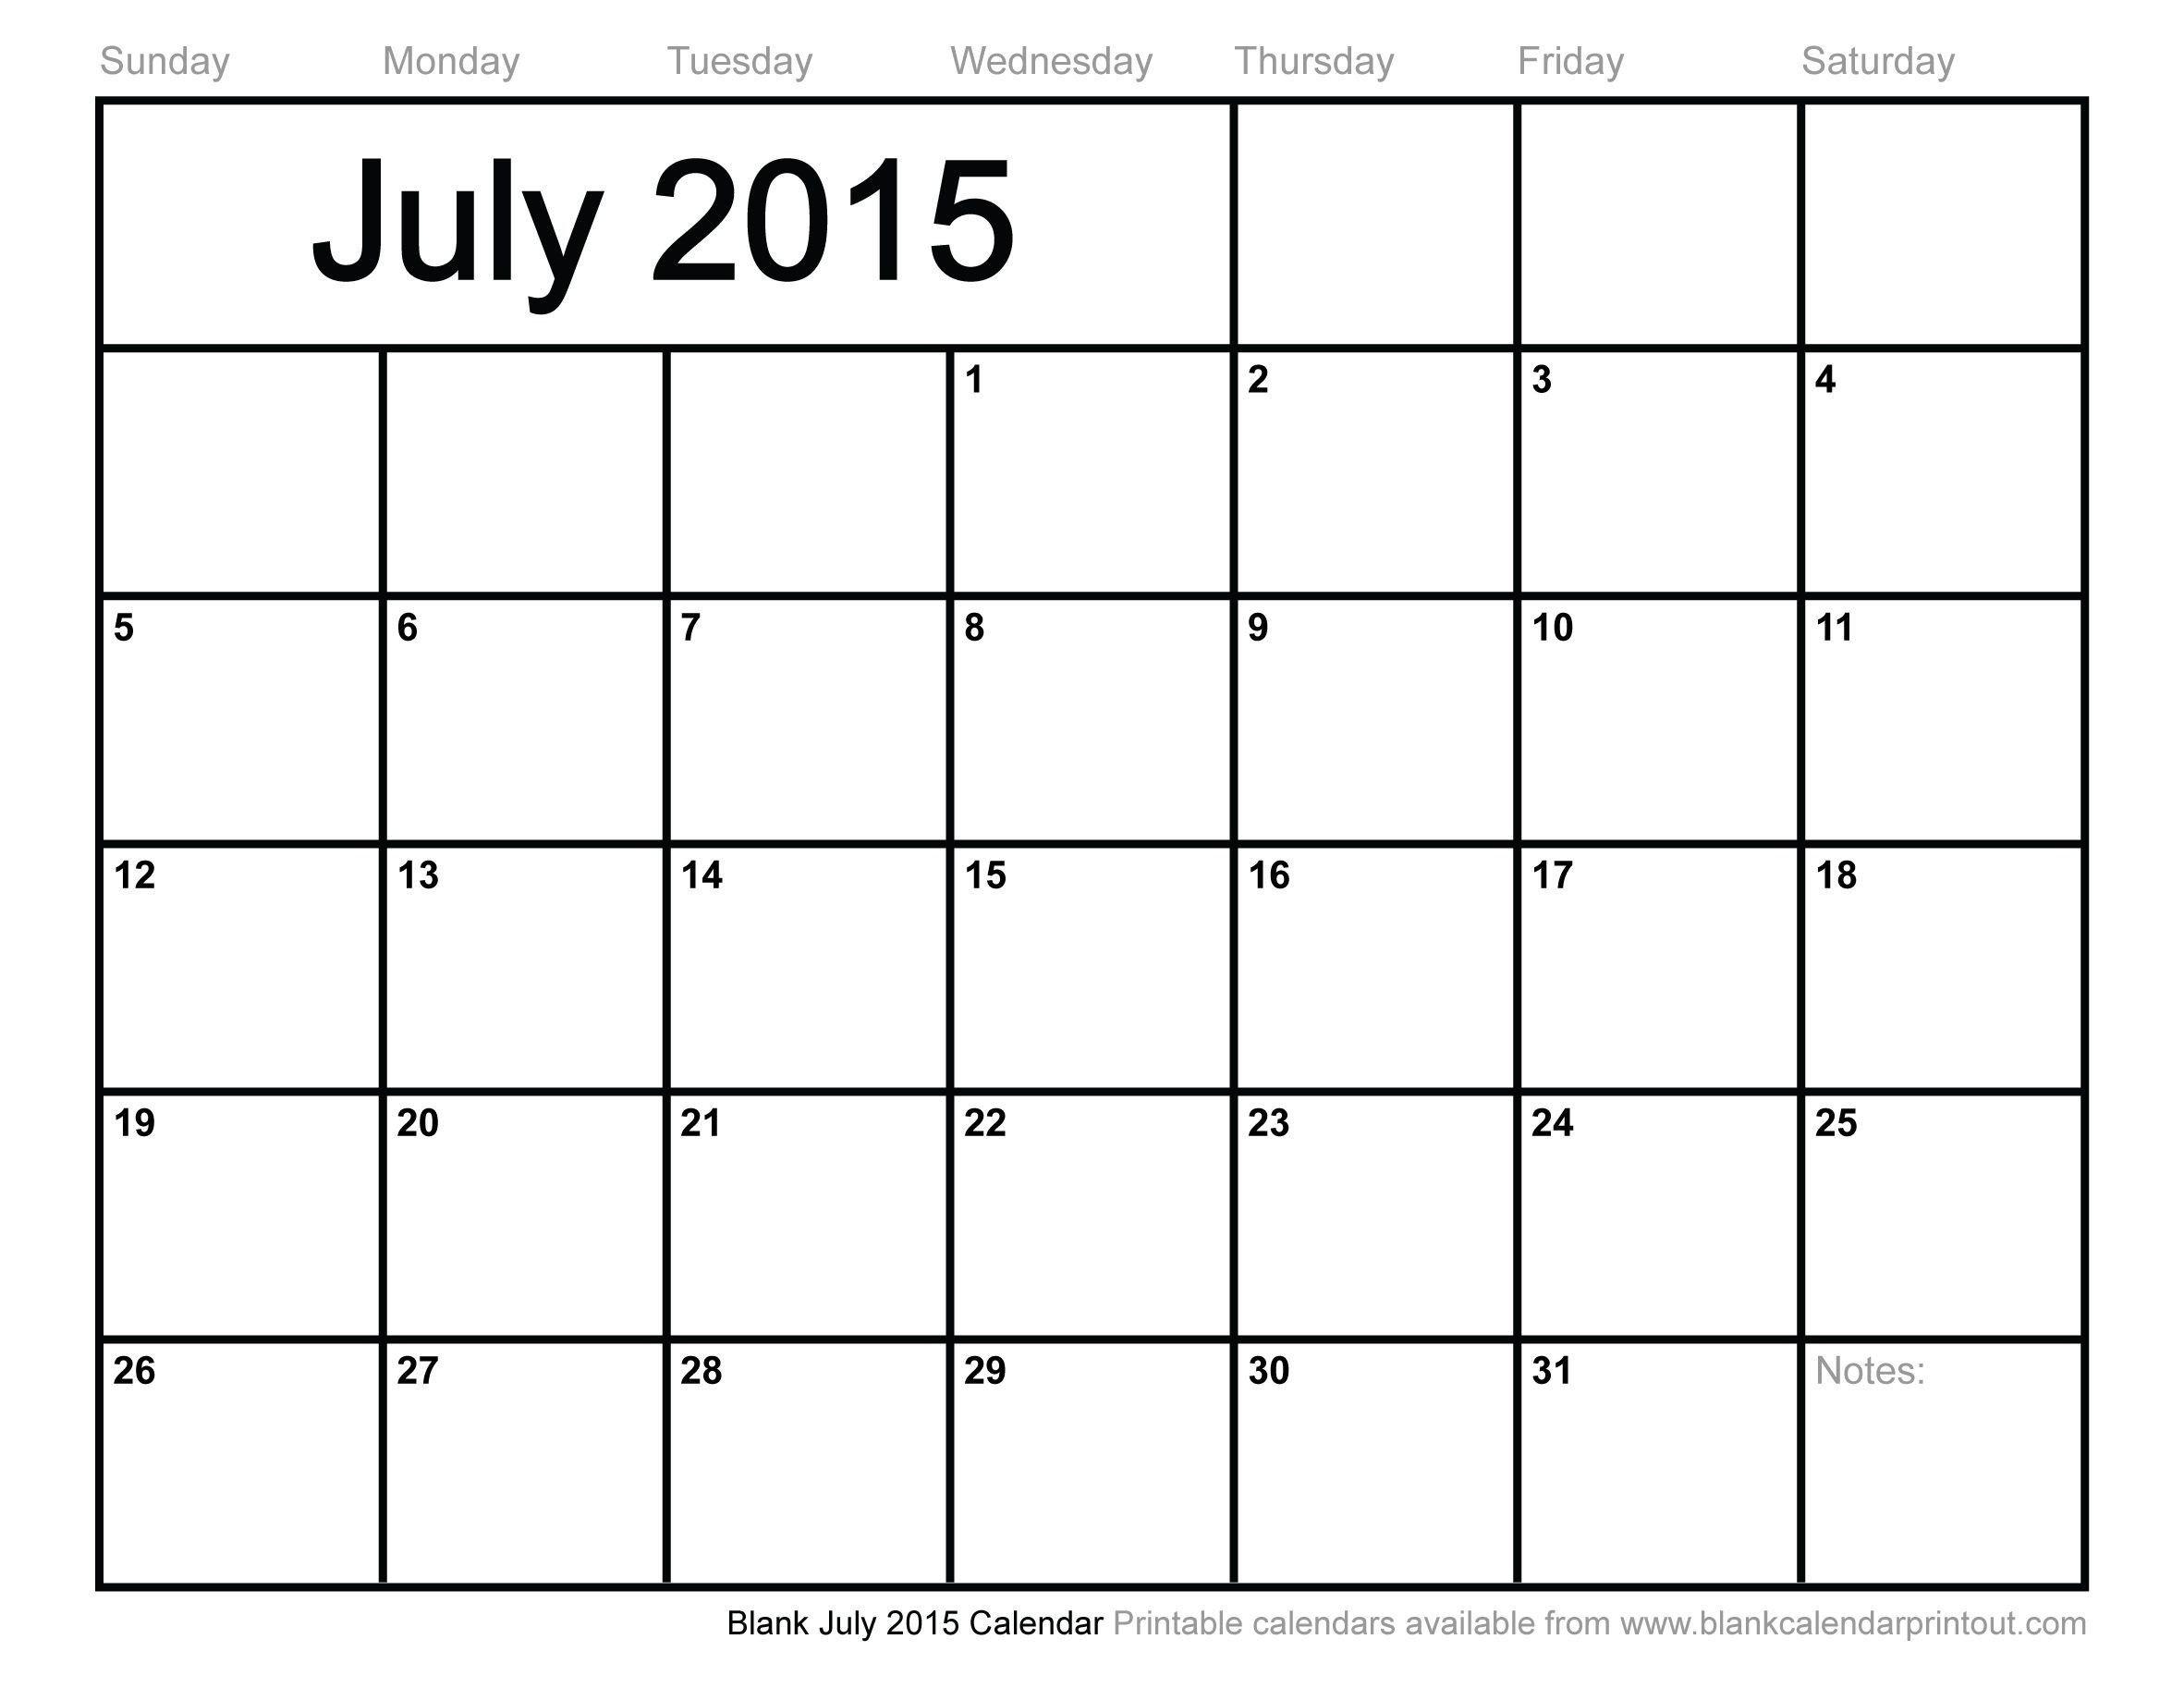 Monthly Calendar Fill In In 2020 | 2015 Calendar Printable Weekly Fill In Calendar